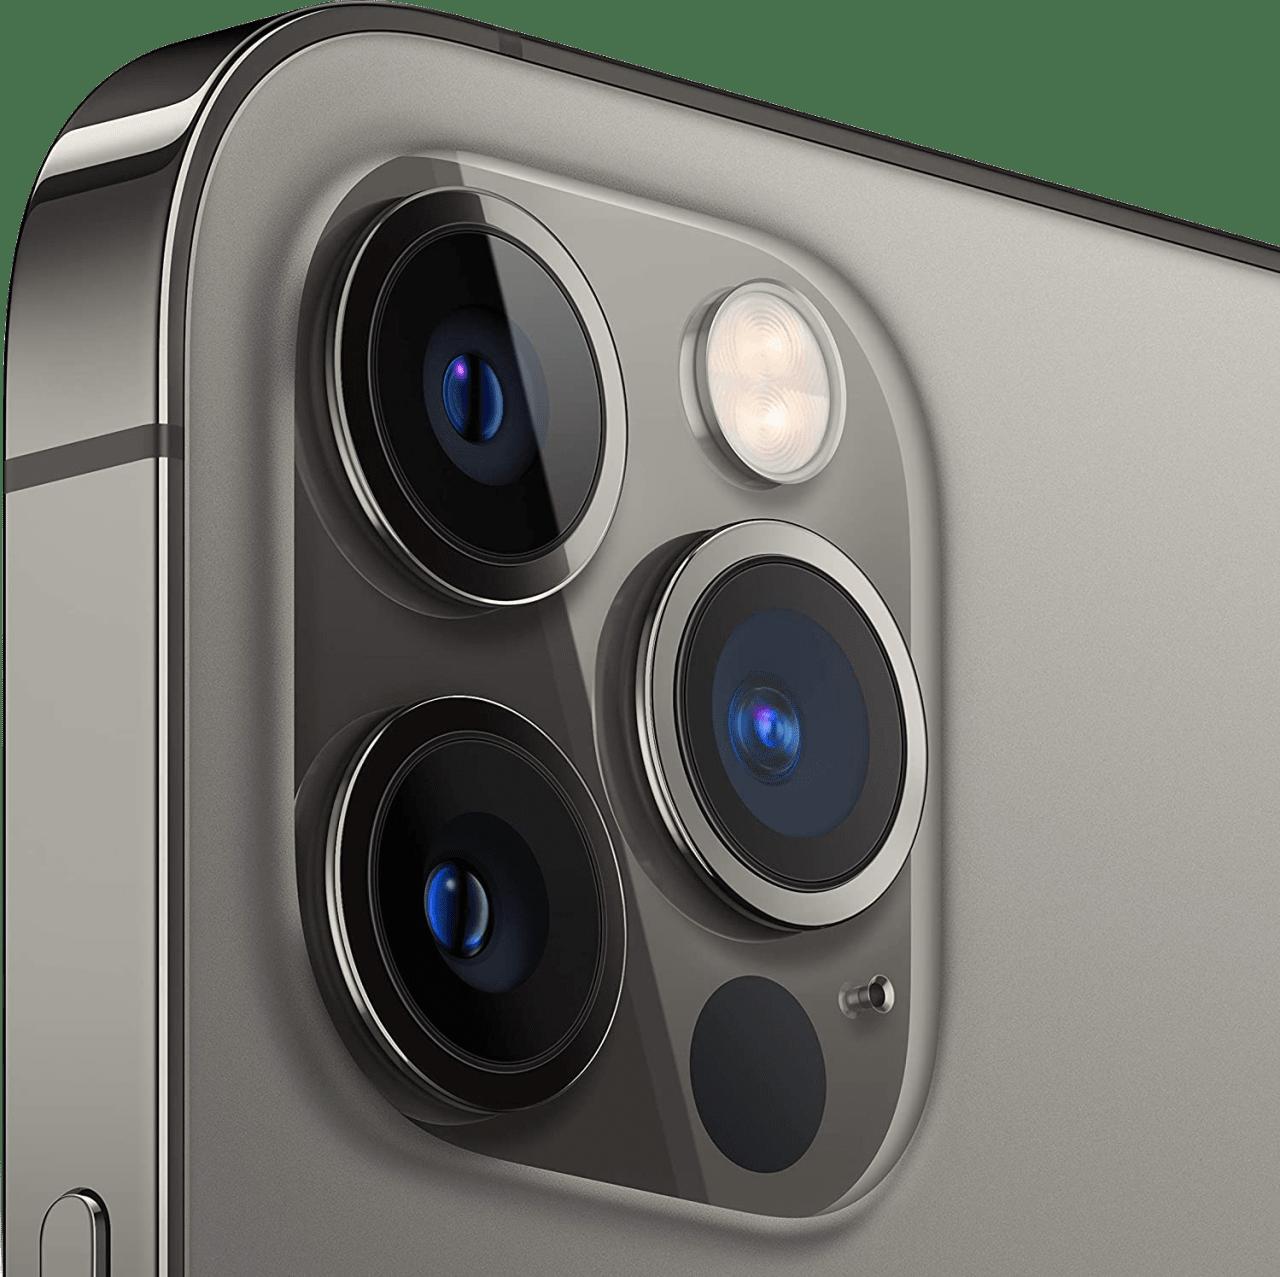 Grau Apple iPhone 12 Pro Max 128GB.4